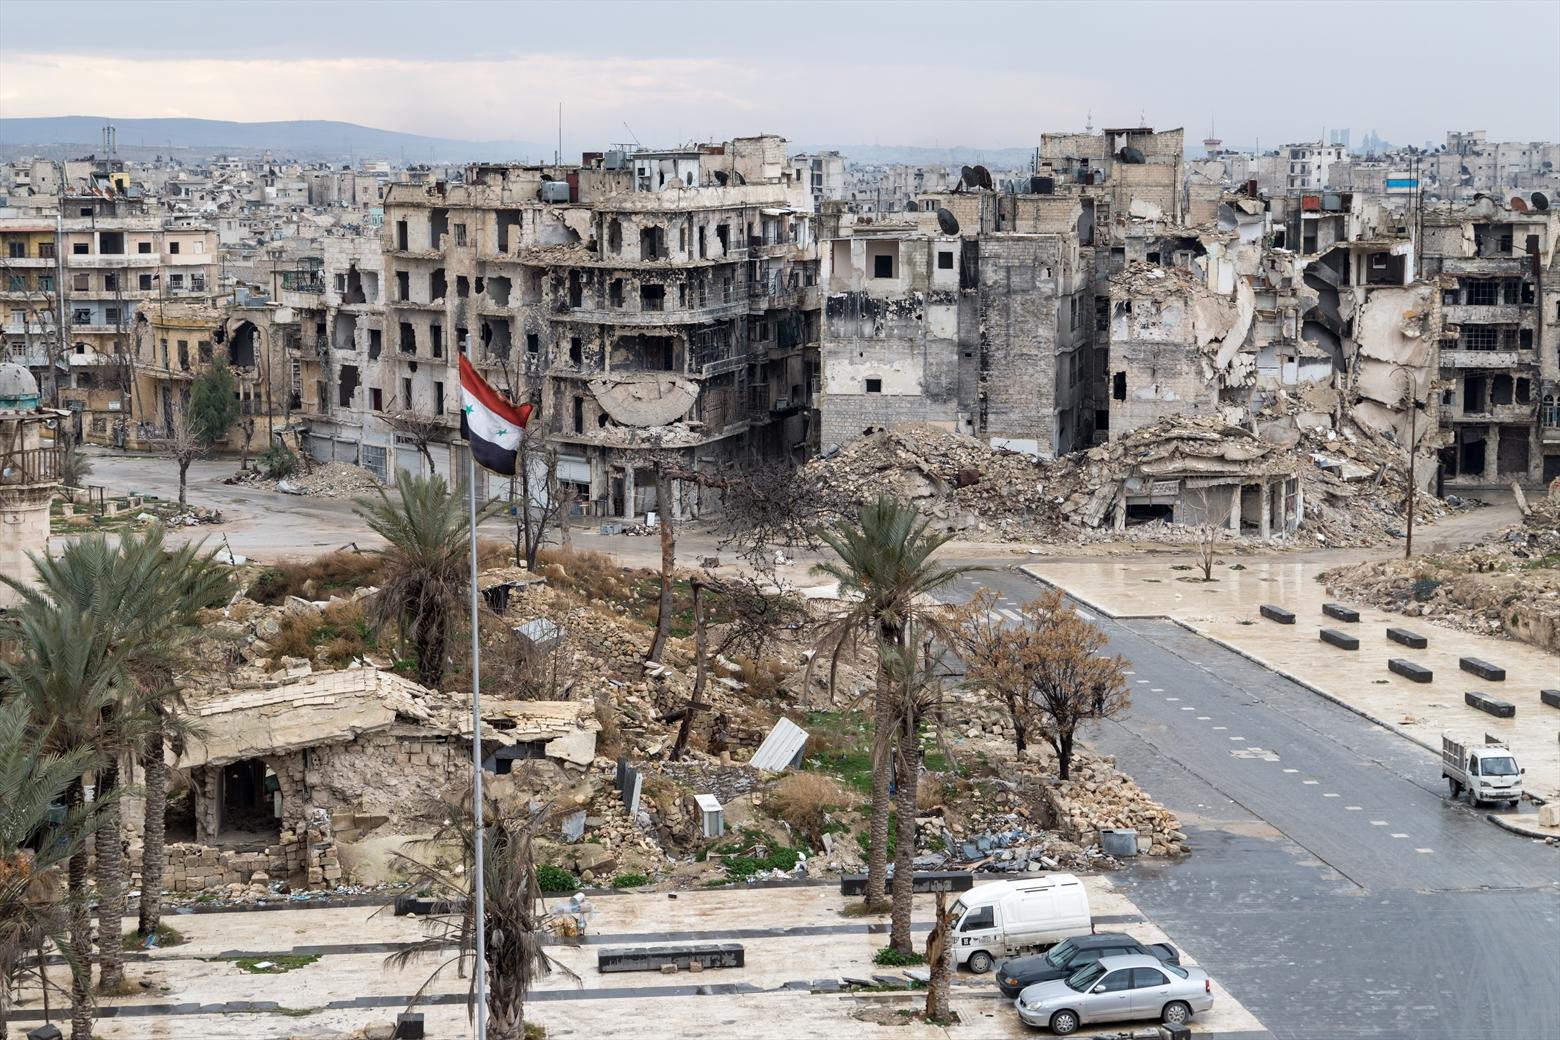 Rebuilding after the seven-year civil war is beginning (Open Doors International)